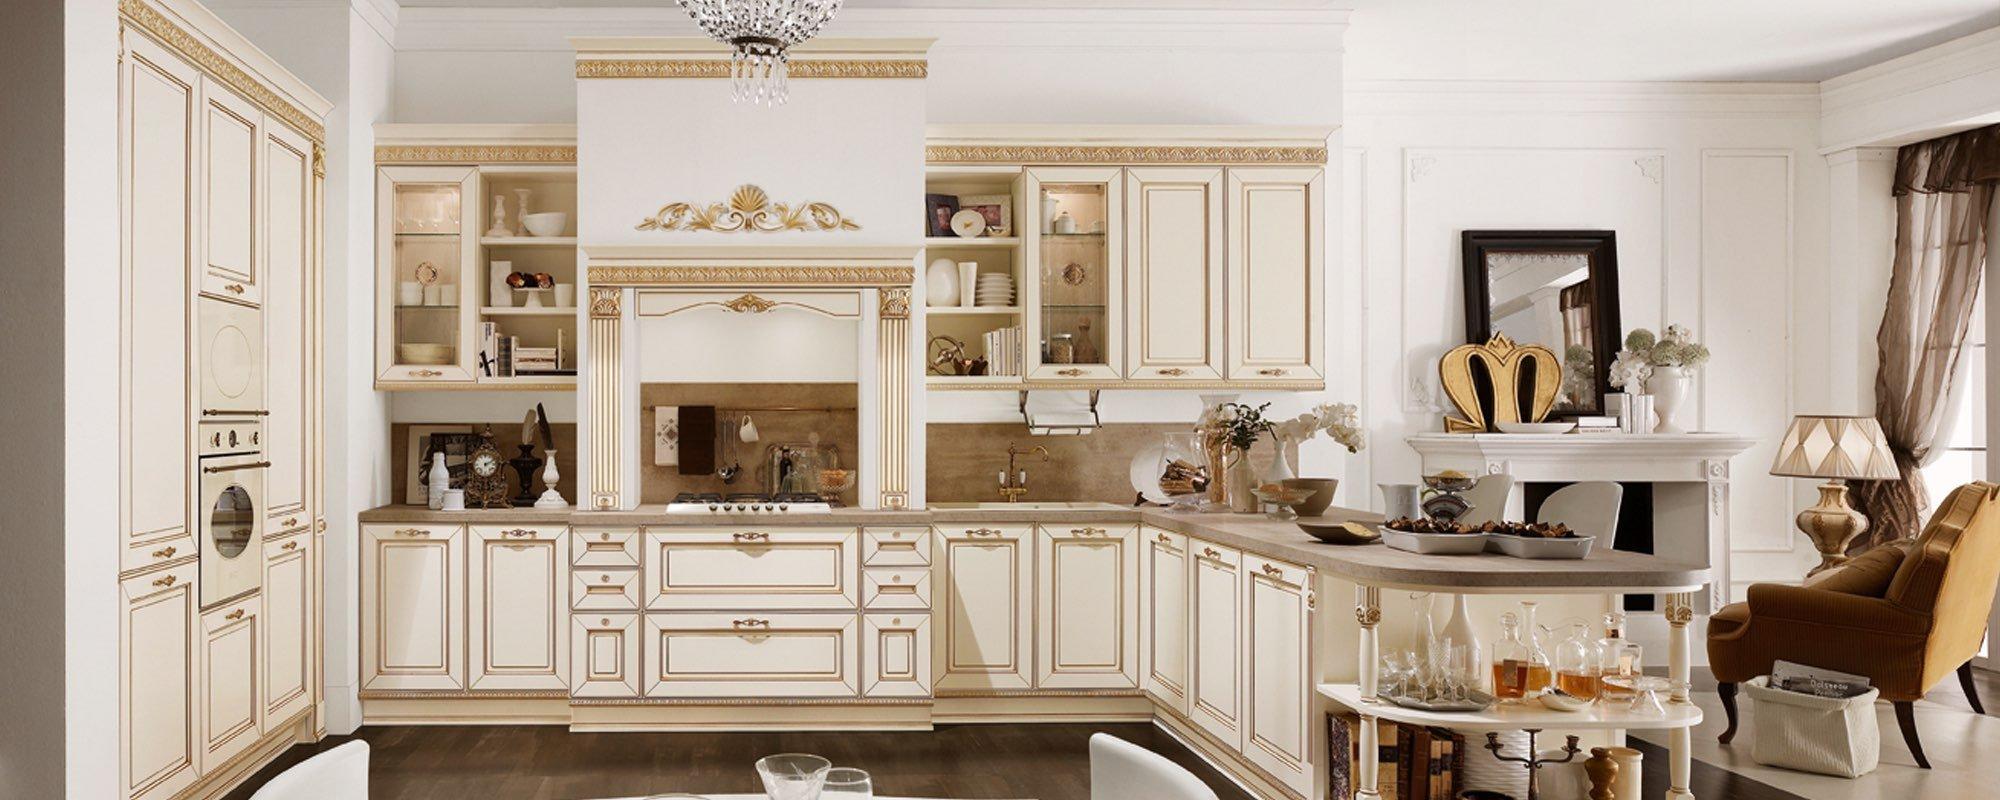 cucina stosa classica - modello cucina Dolcevita